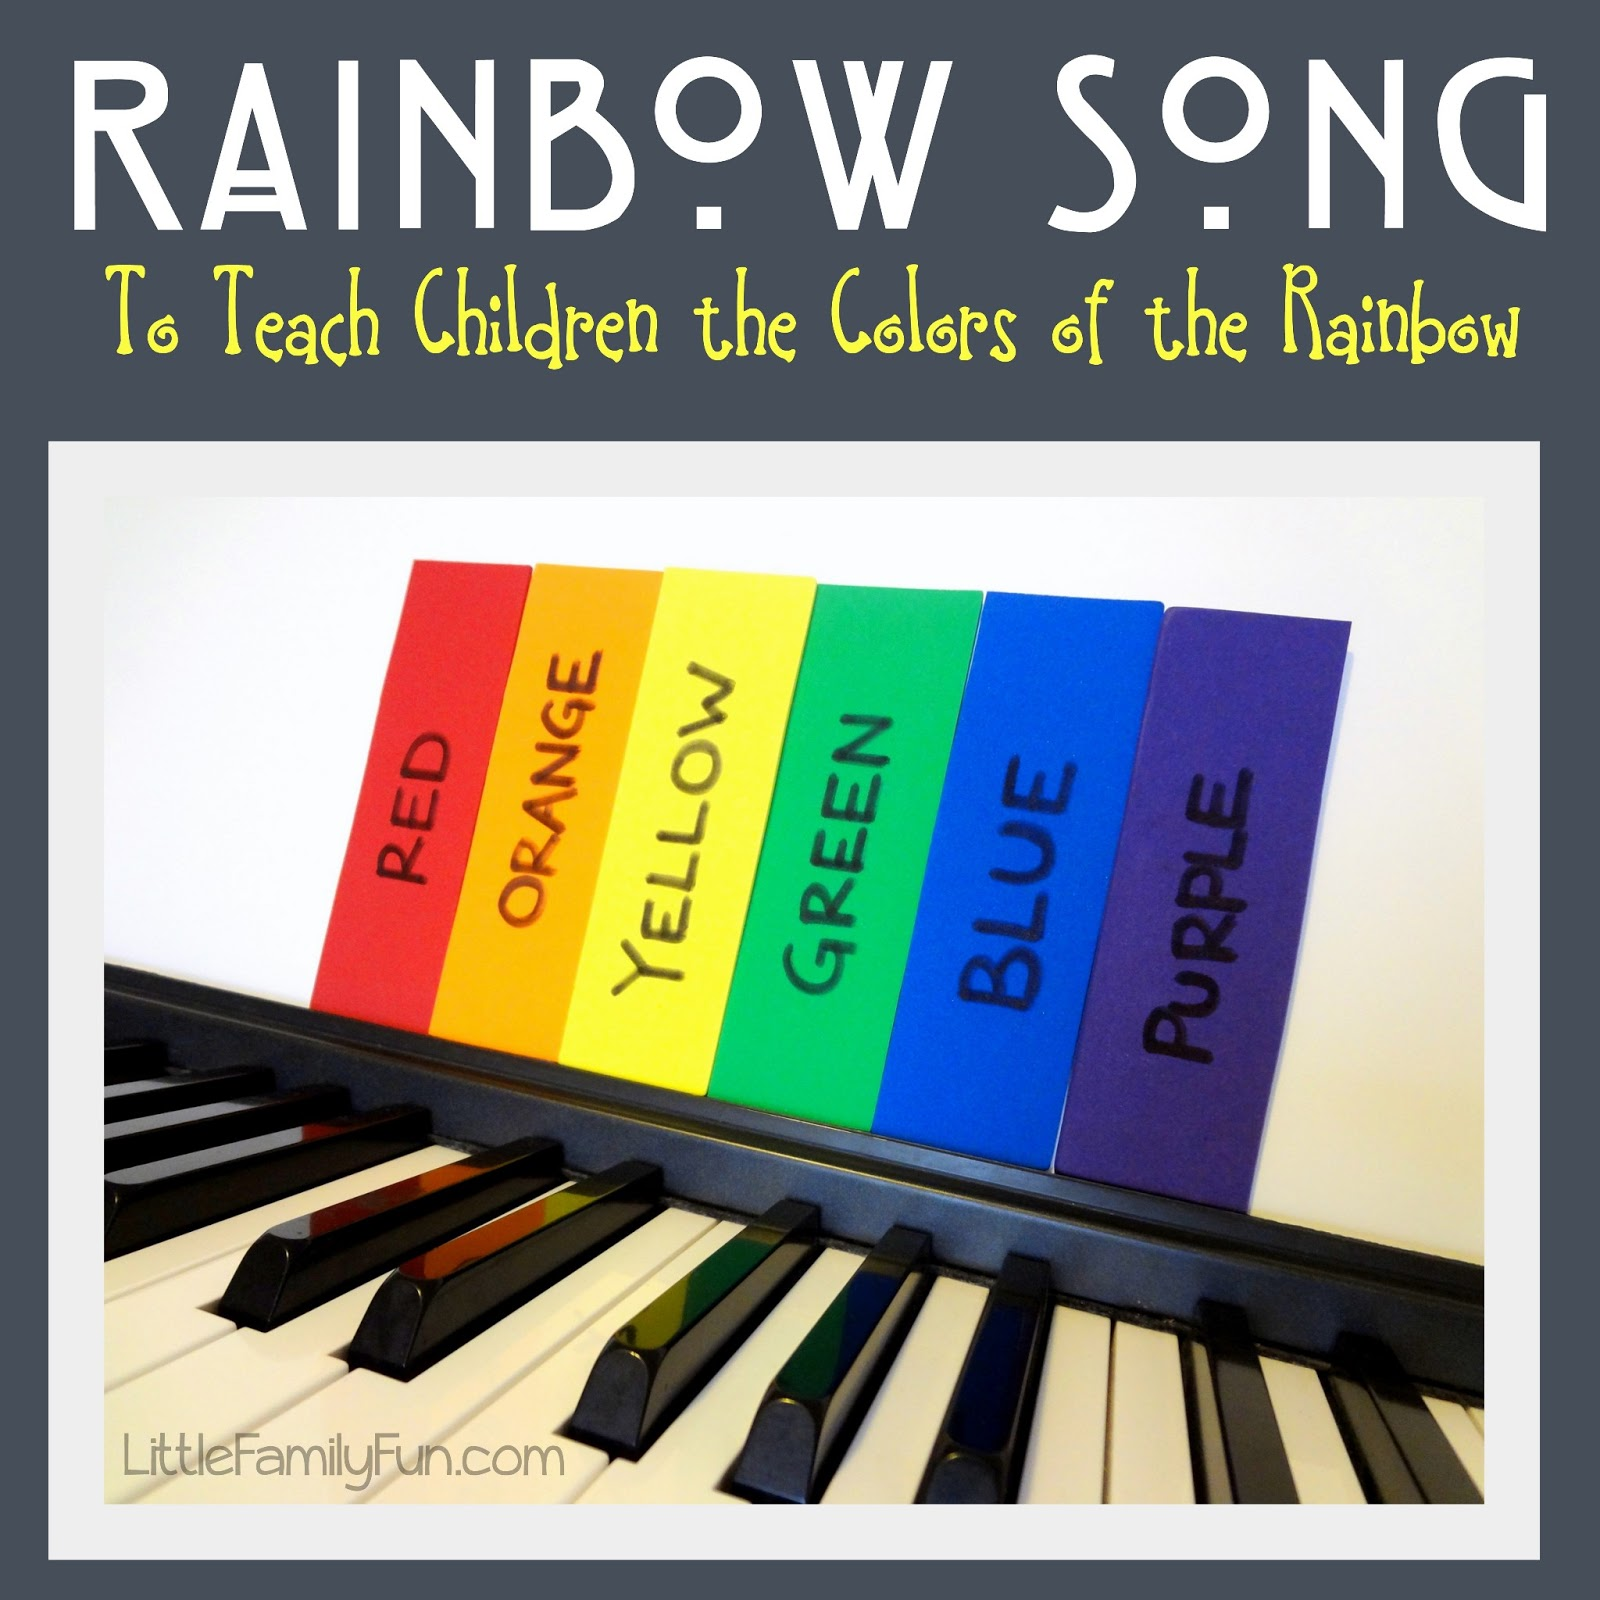 Little Family Fun Rainbow Song